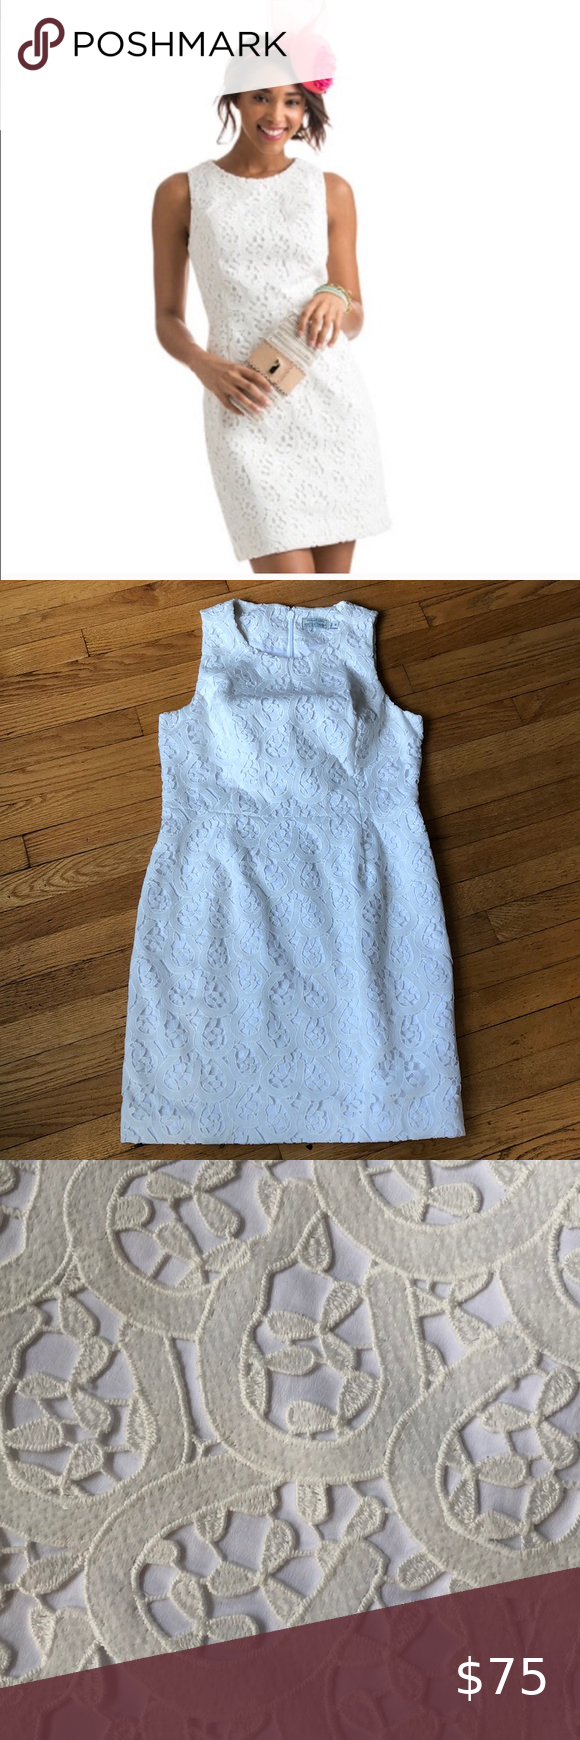 Gorgeous Vineyard Vines White Lace Dress Lace White Dress Lace Dress Dresses [ 1740 x 580 Pixel ]